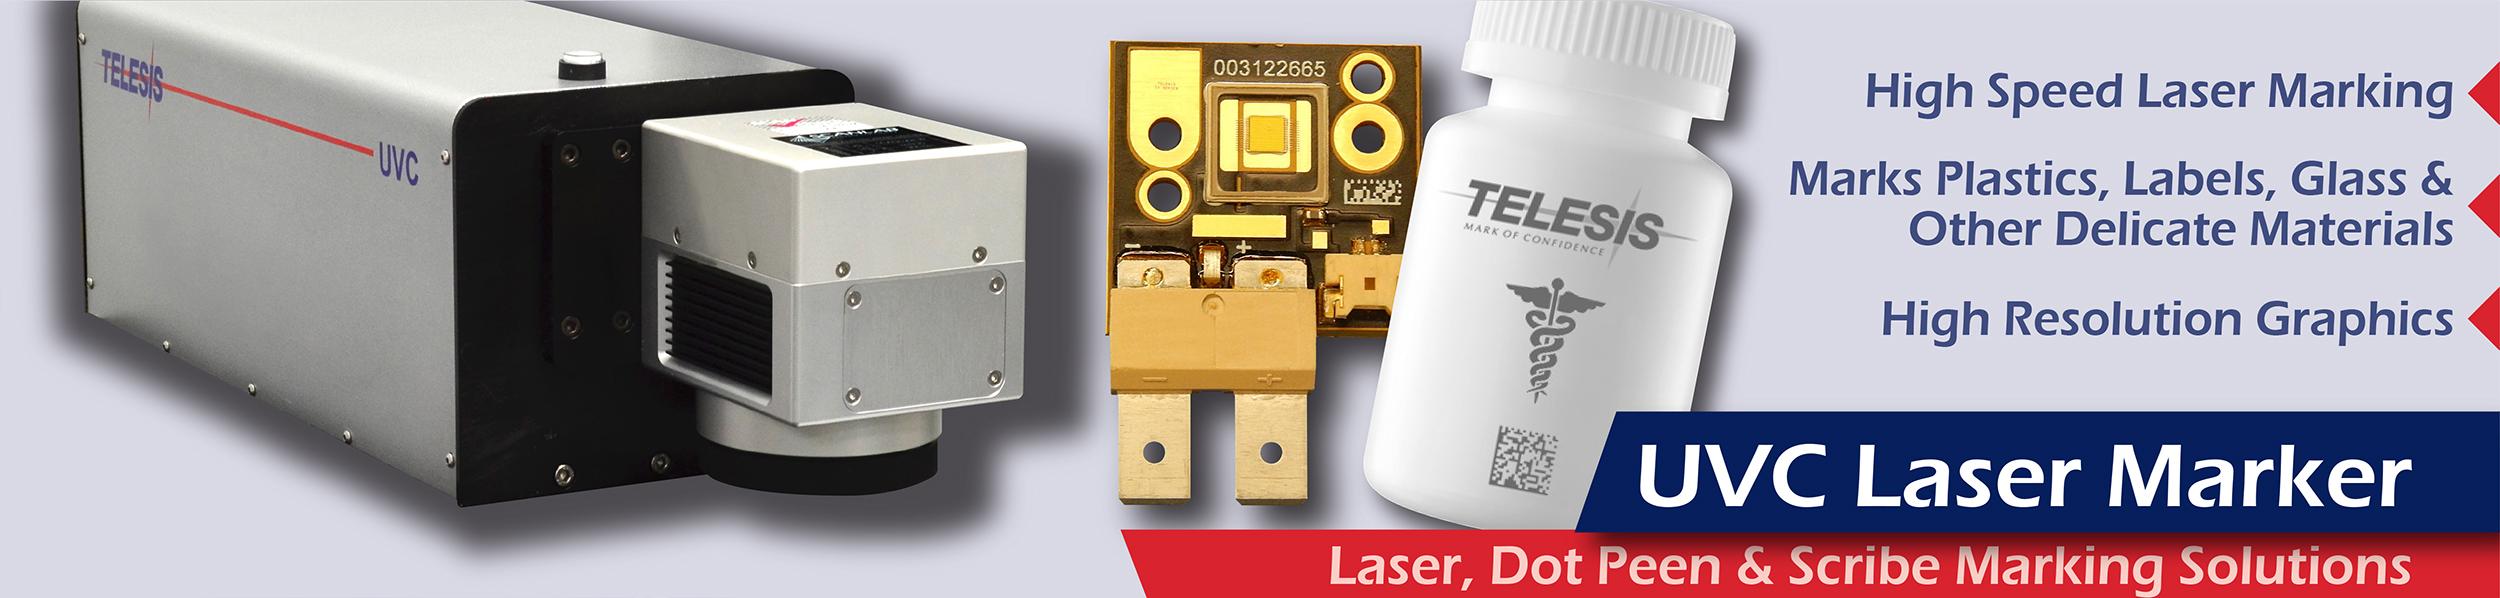 UVC Laser Marking System